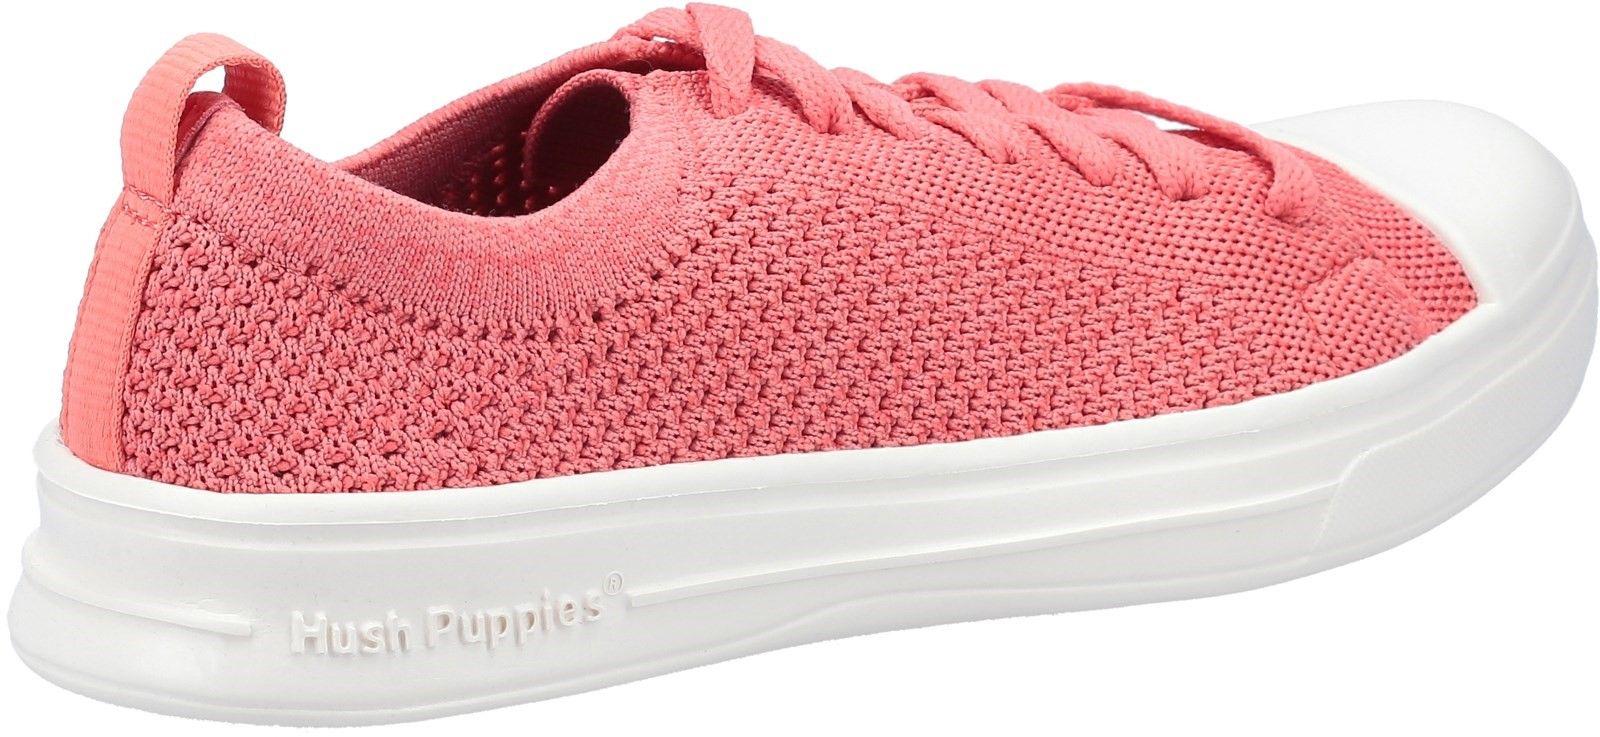 Schnoodle Lace Up Summer Shoe